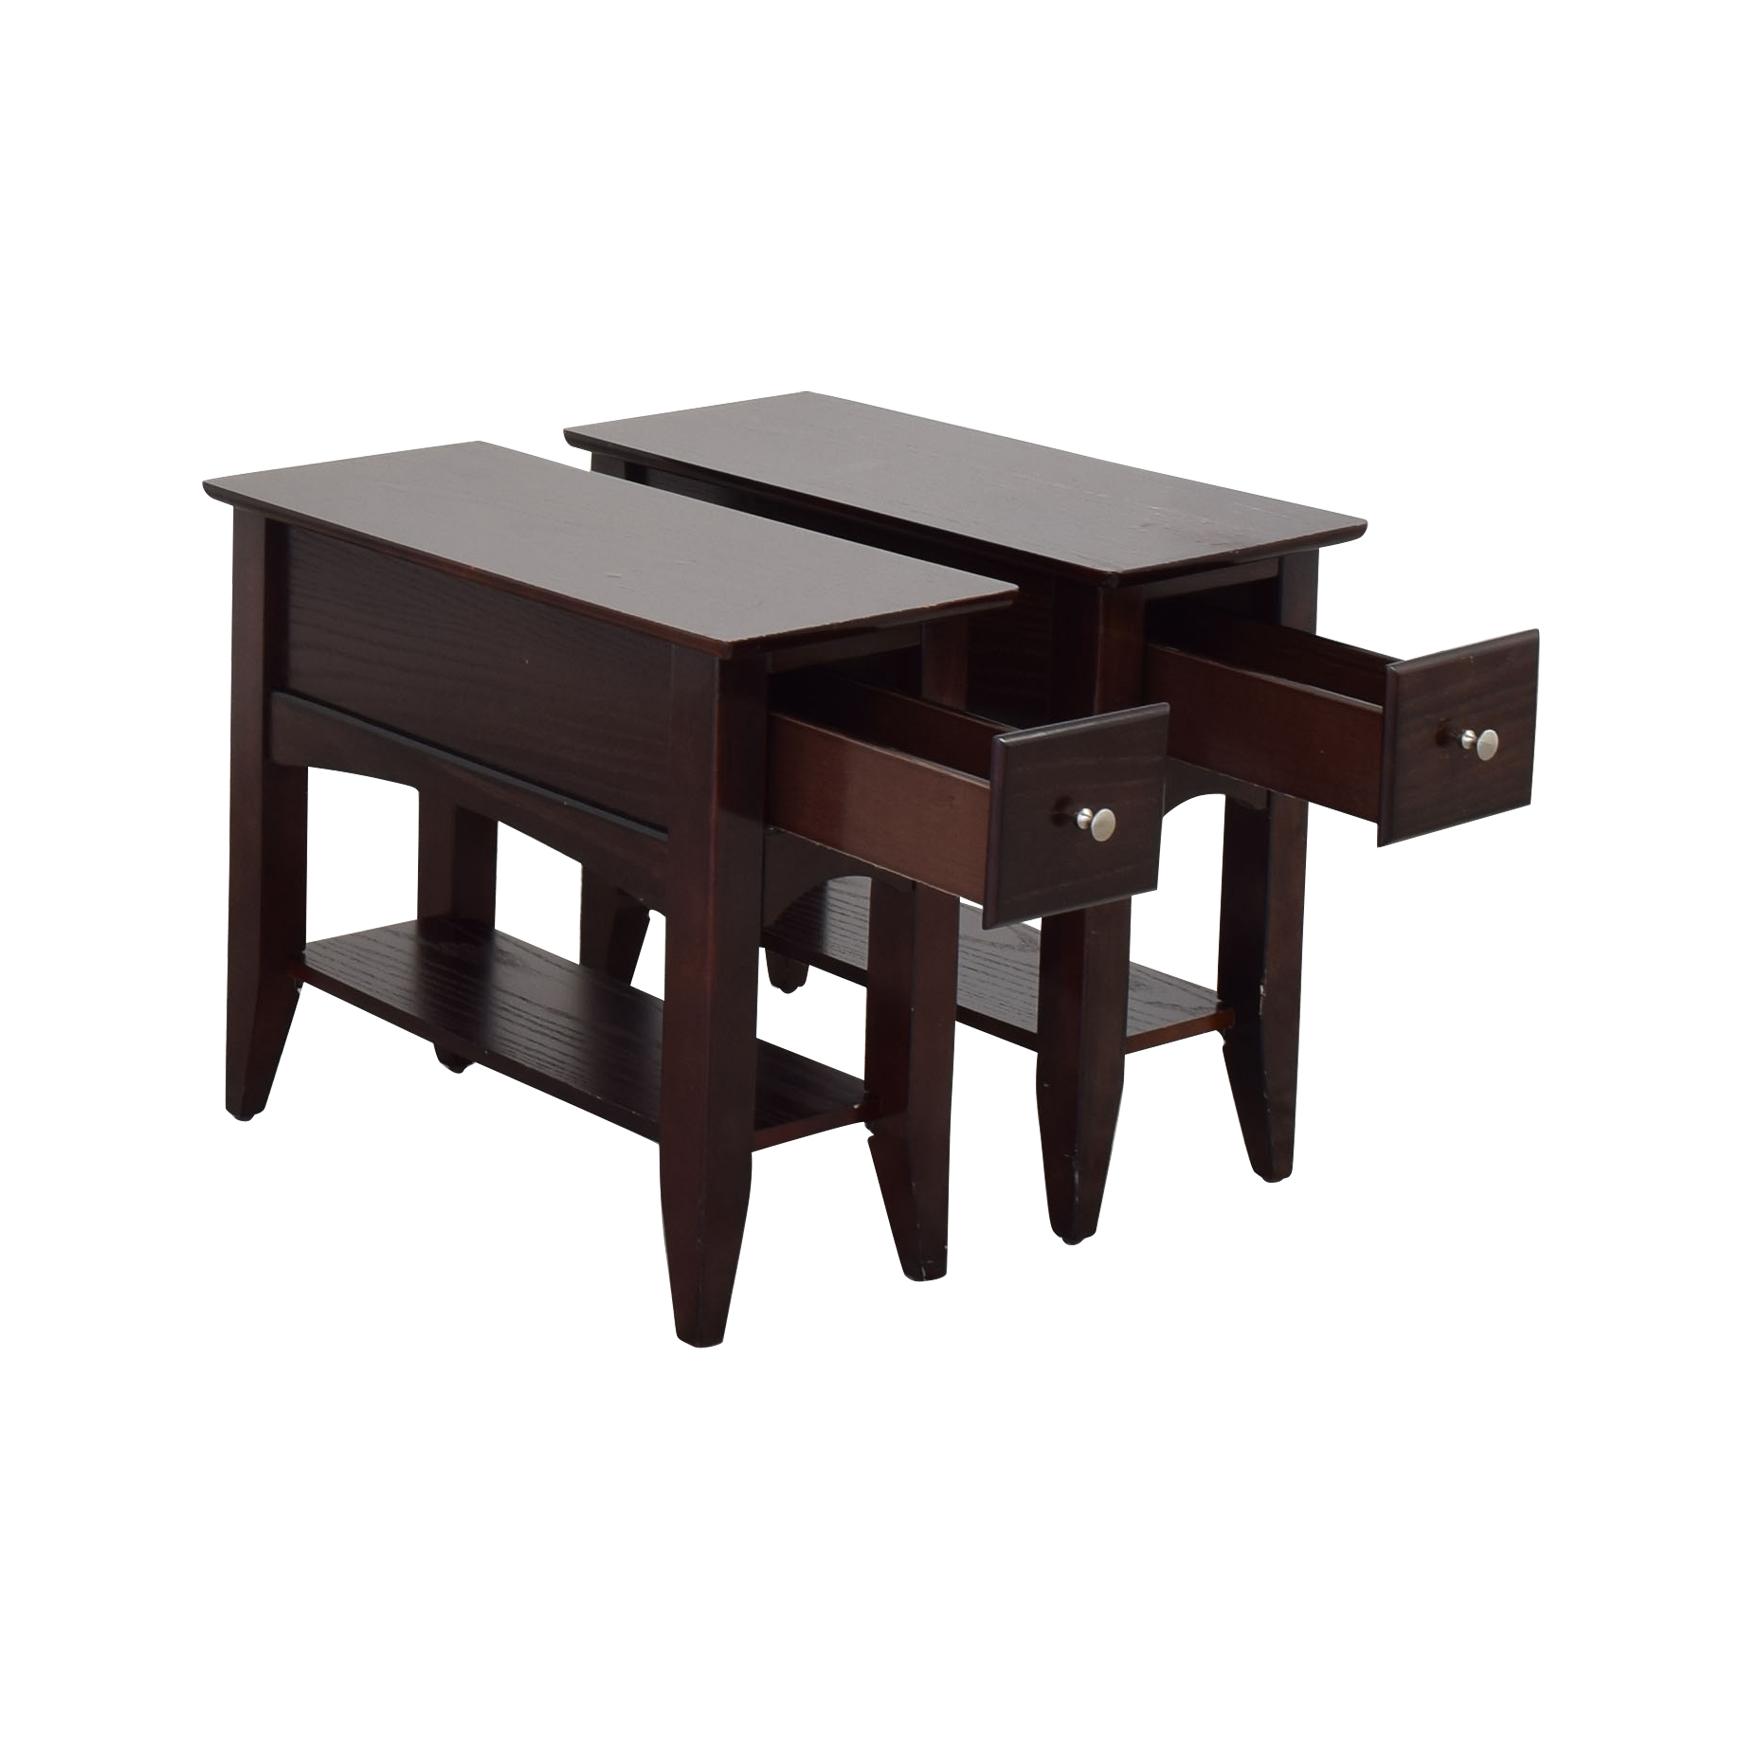 Riverside Furniture Metro II End Tables sale